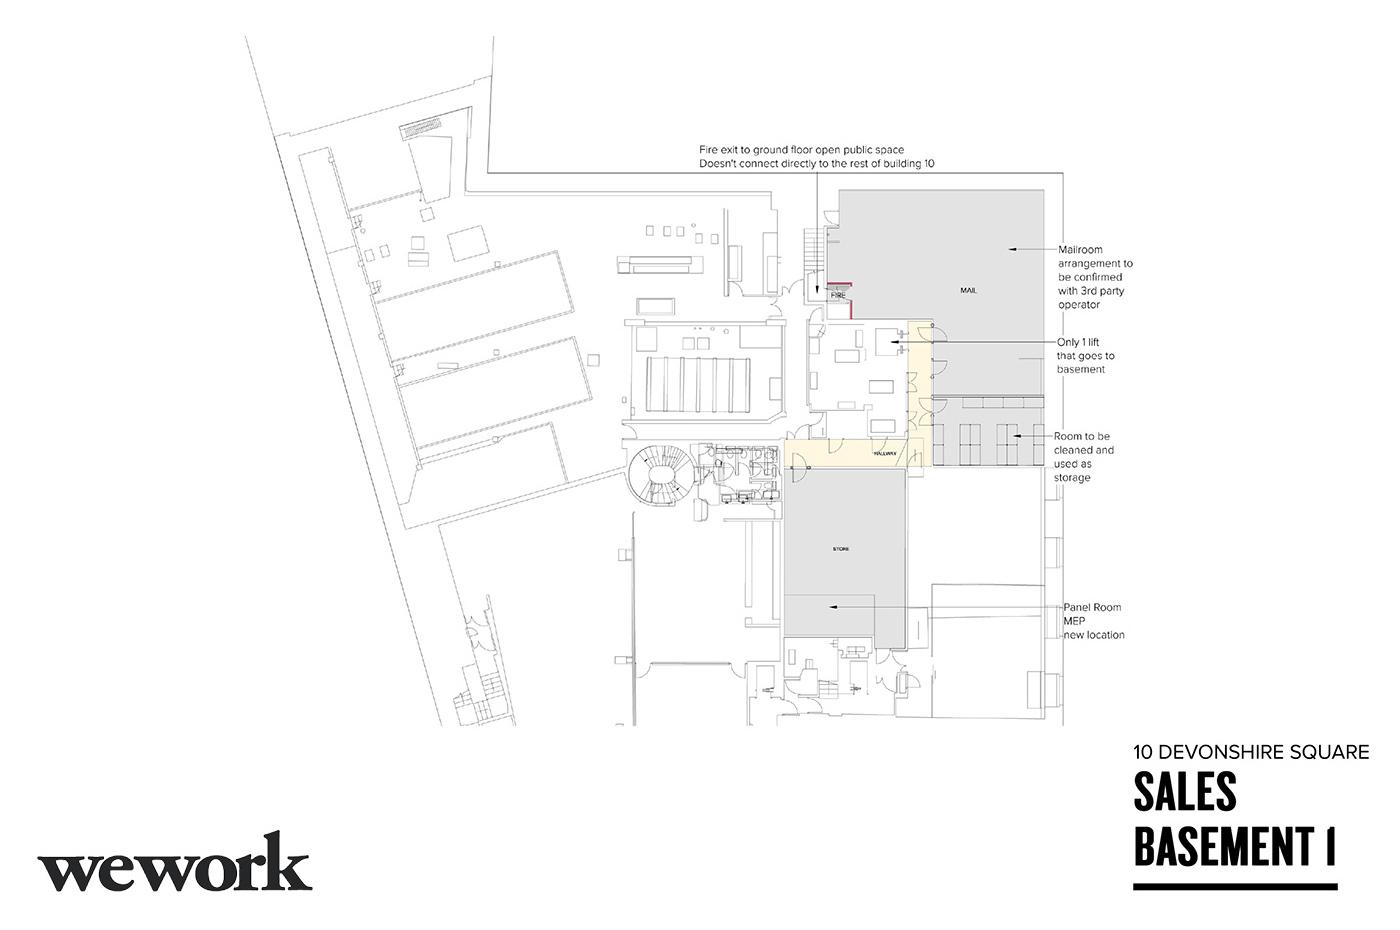 floorplans-11 copy.jpg